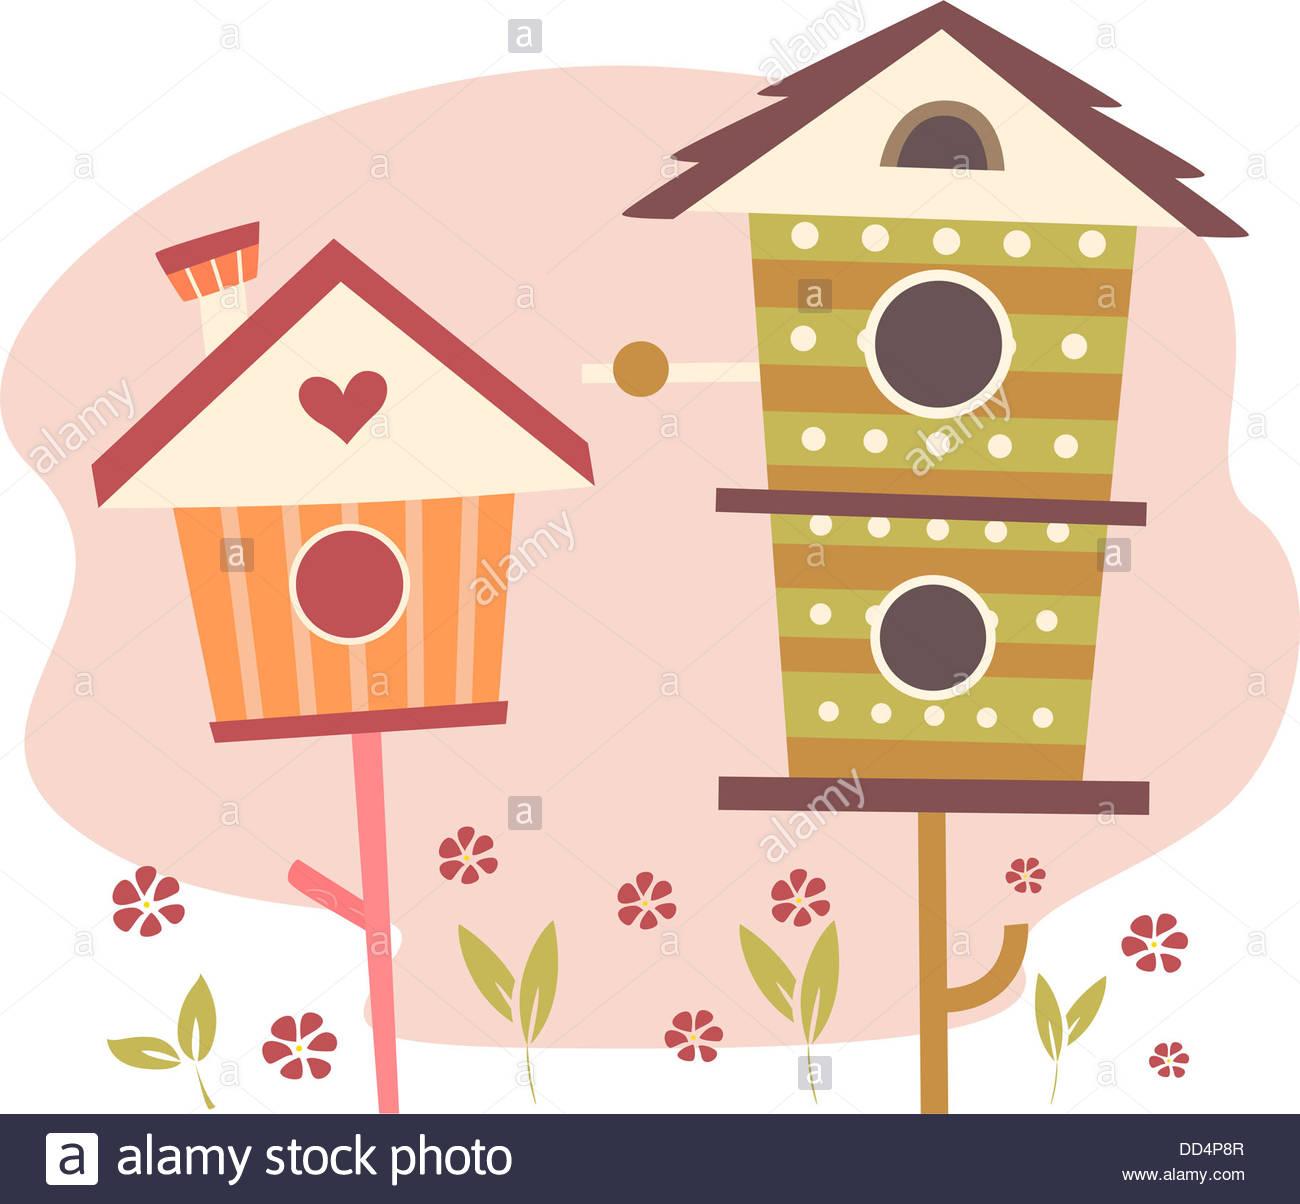 Cute bird houses for. Birdhouse clipart abstract